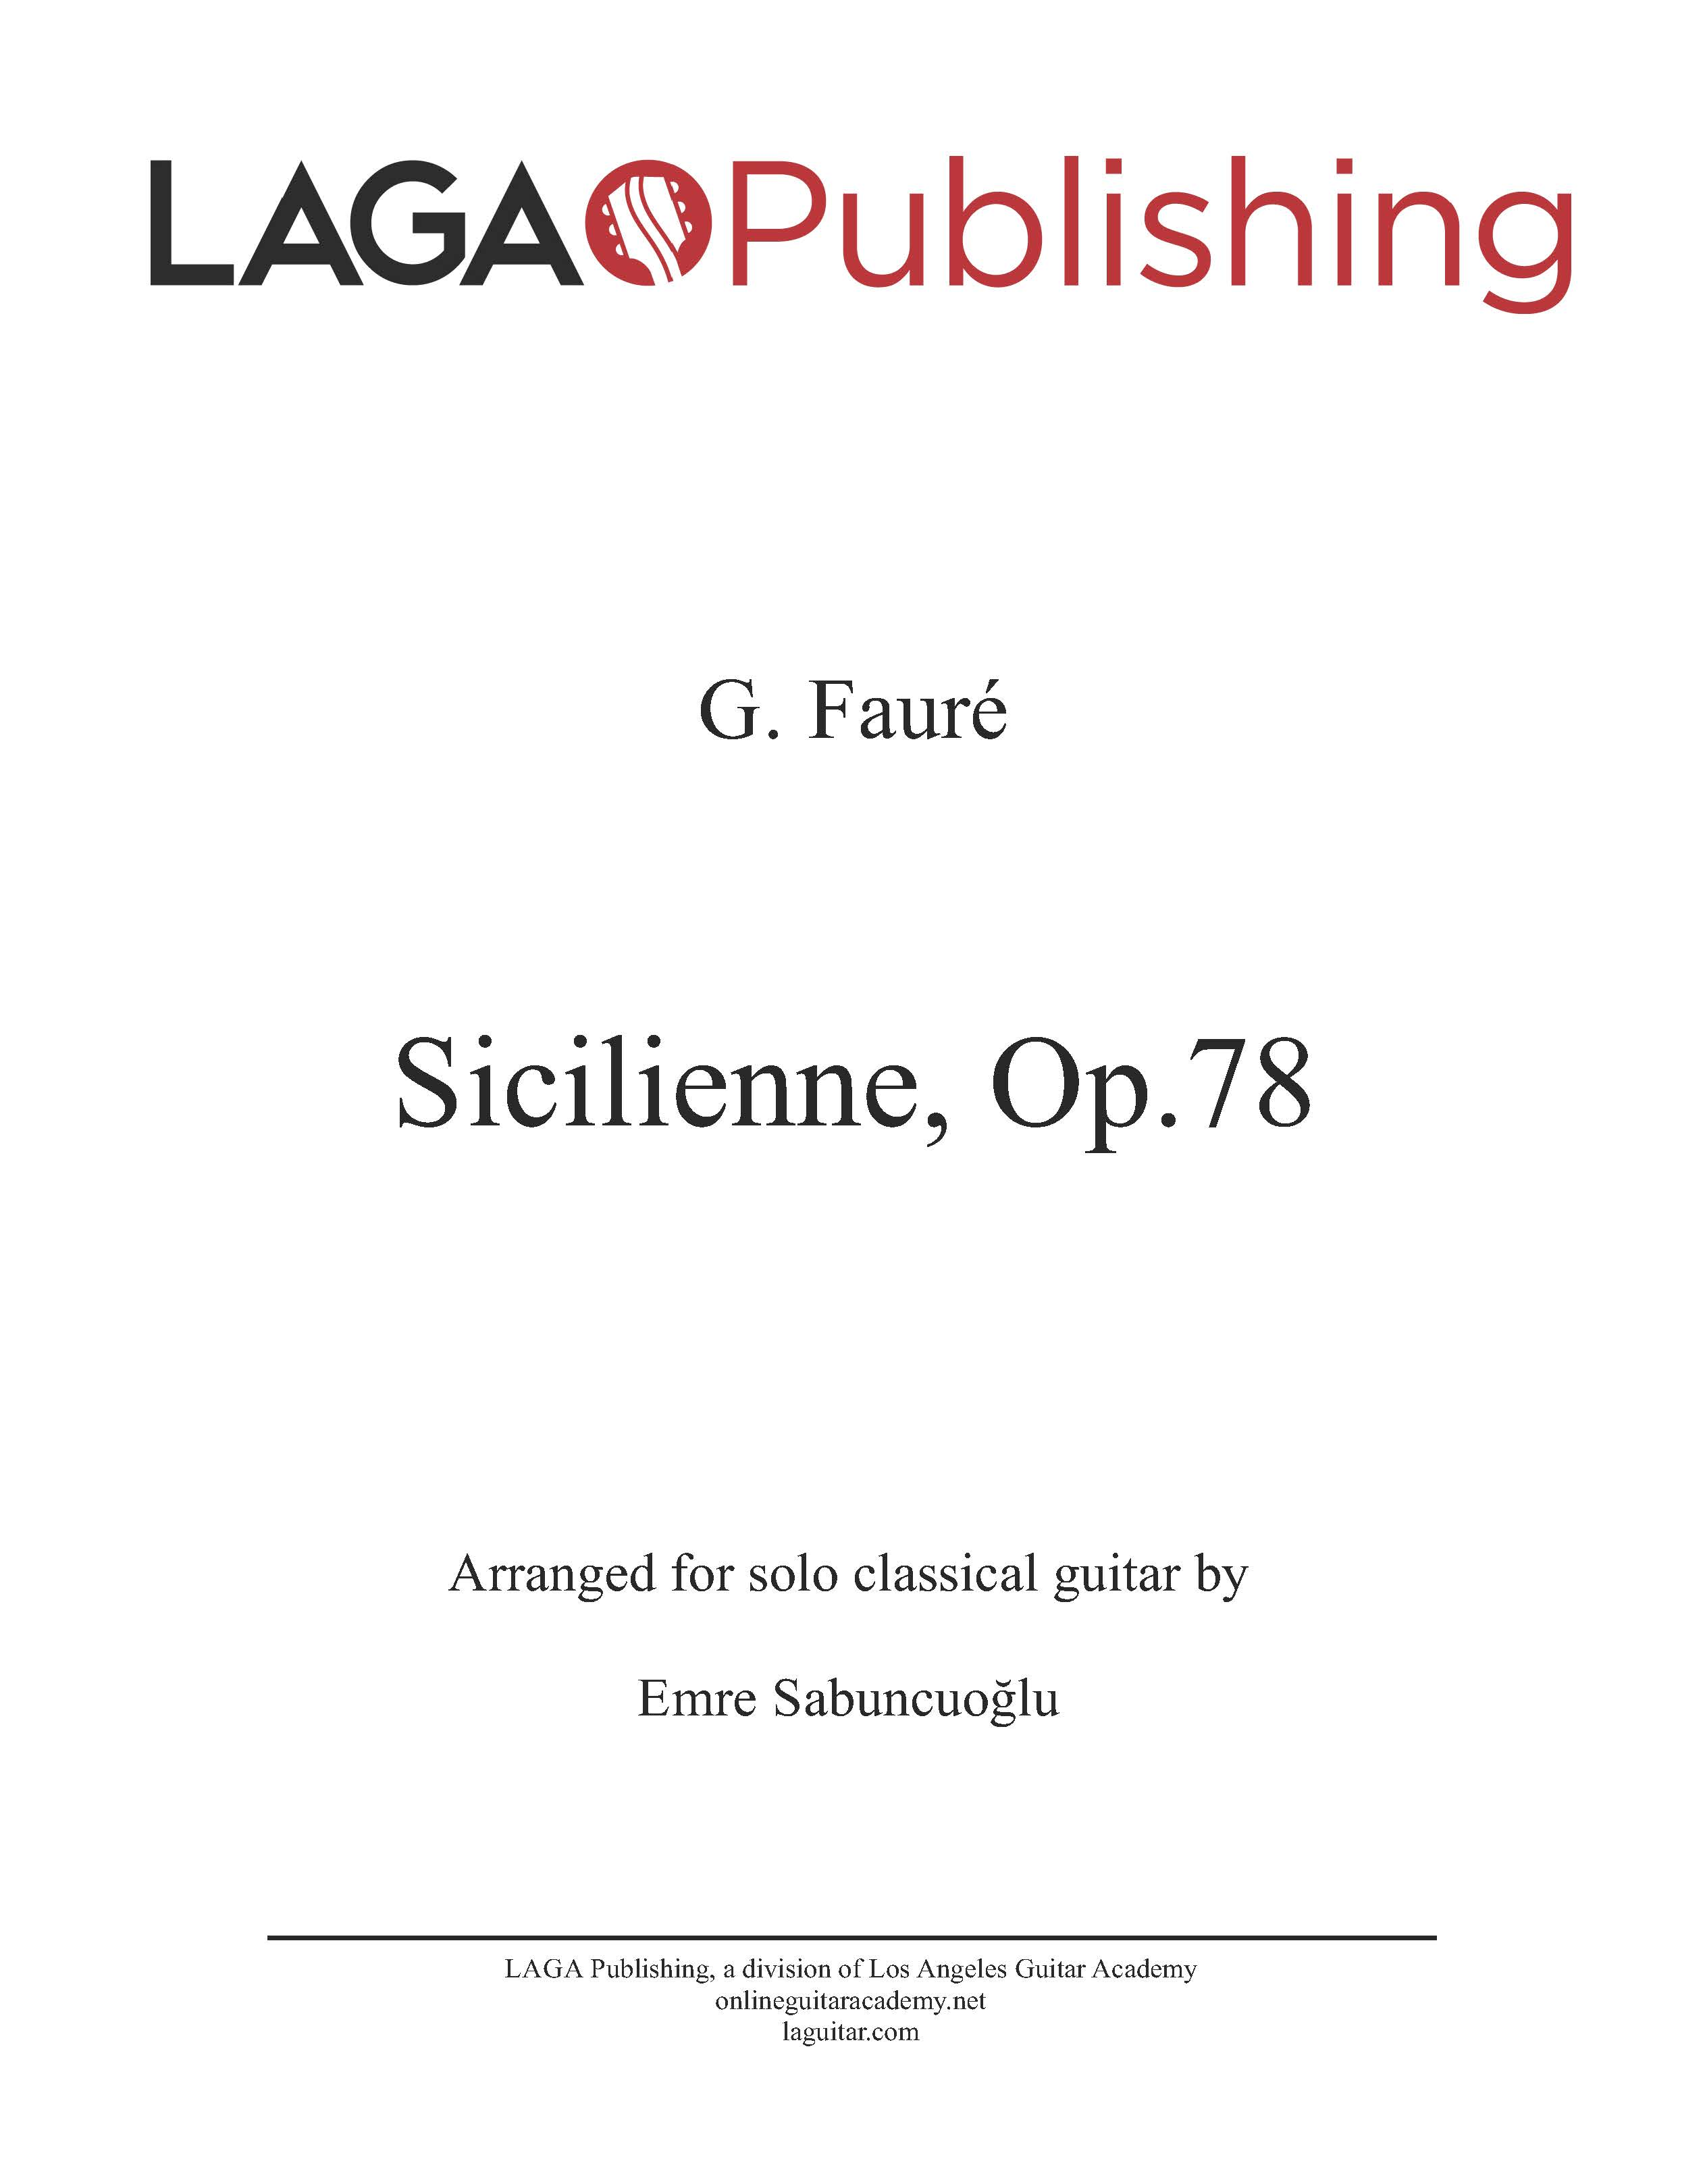 LAGA-Publishing-Faure-Sicilienne-Score-and-Tab